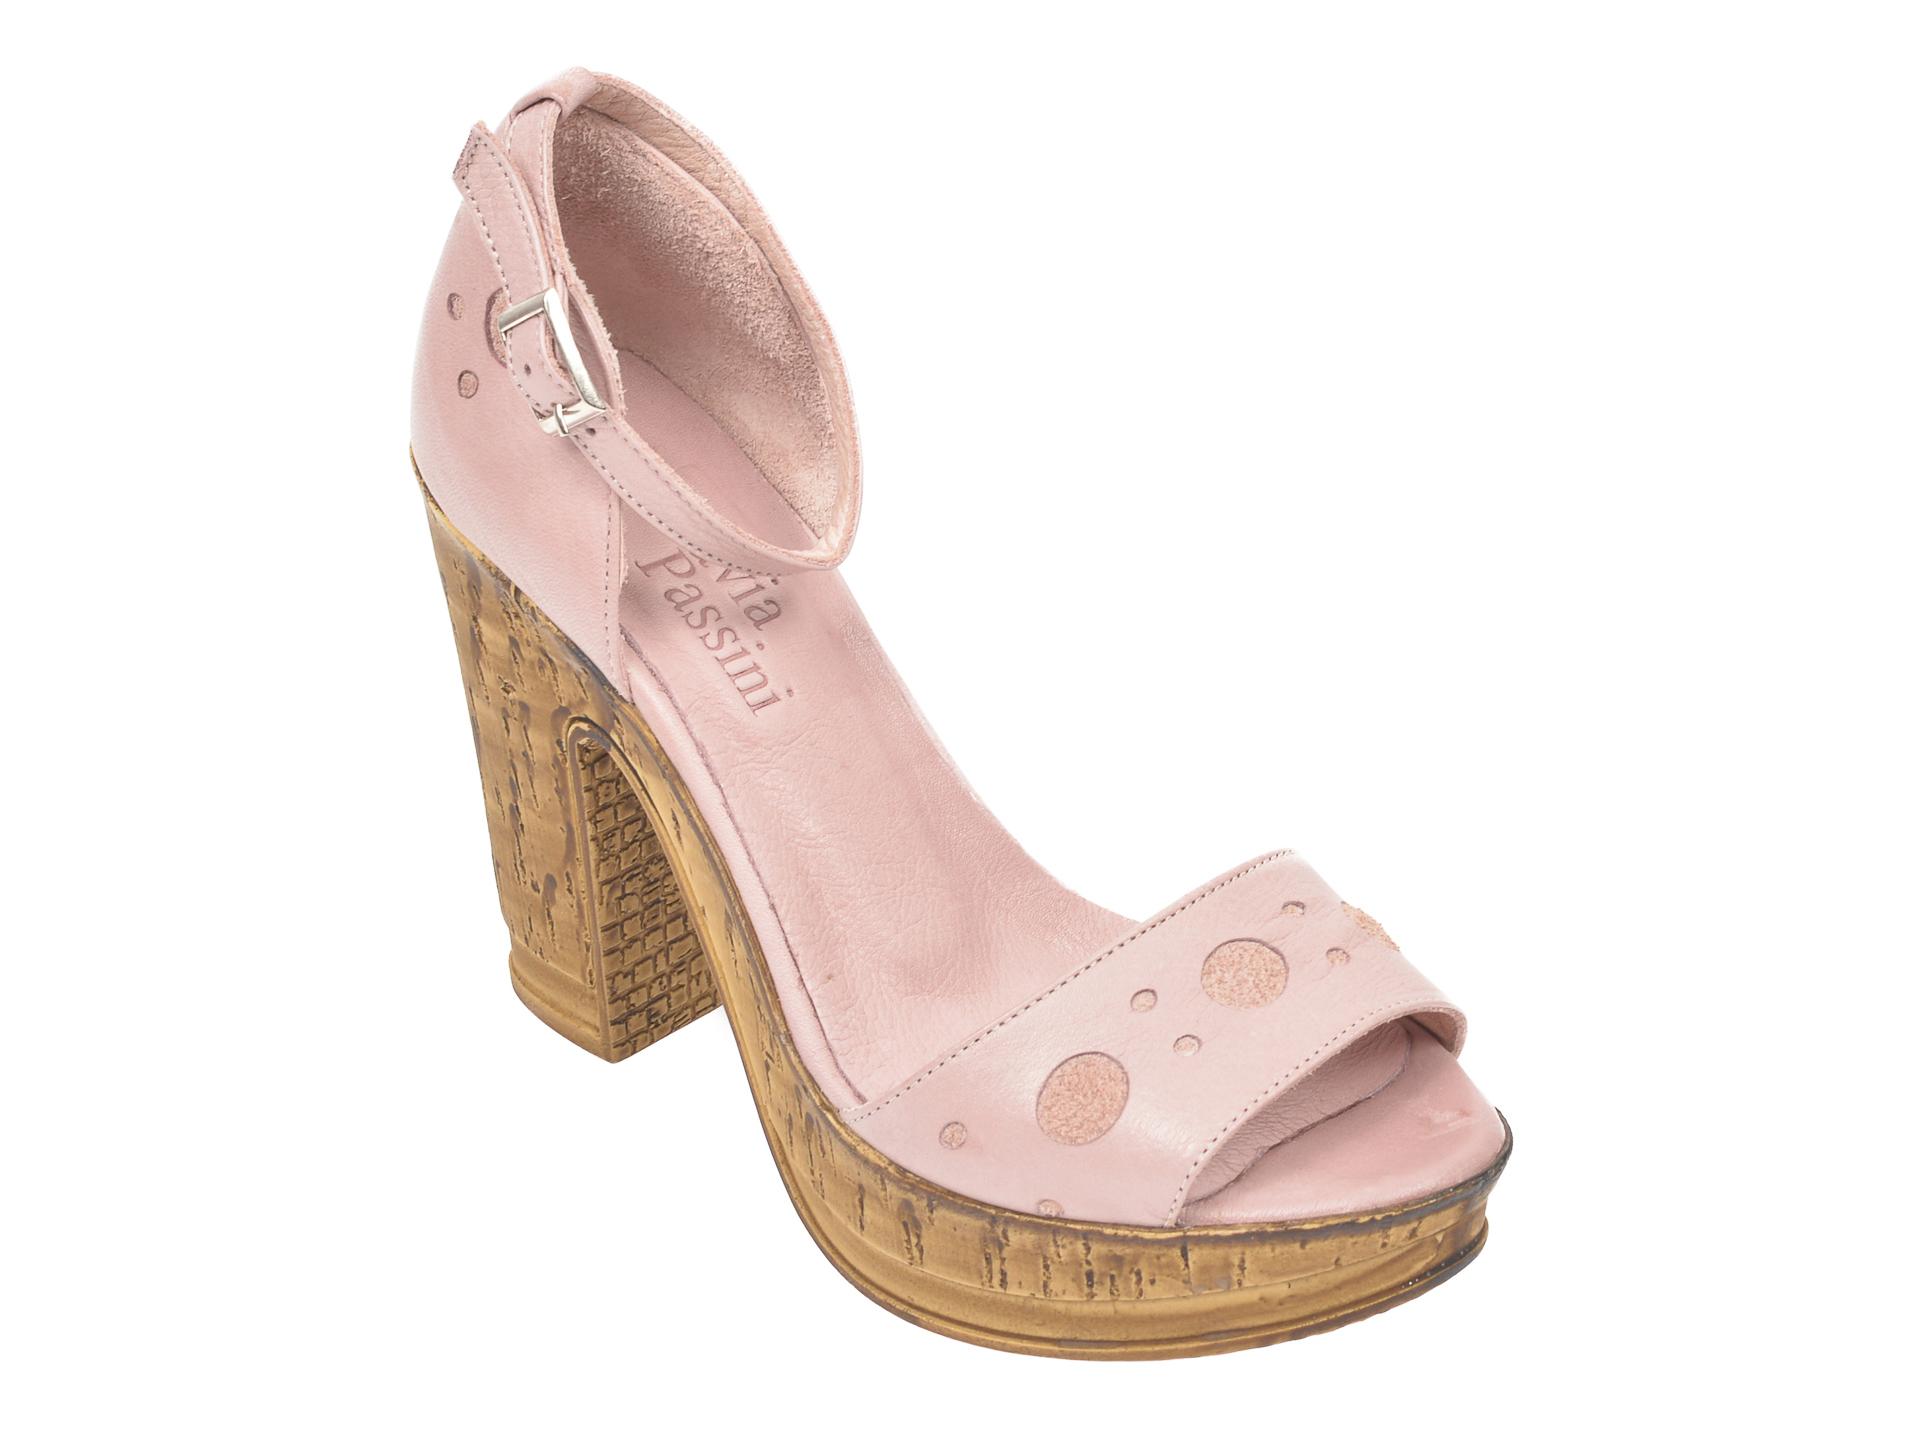 Sandale FLAVIA PASSINI roz, 2605, din piele naturala imagine